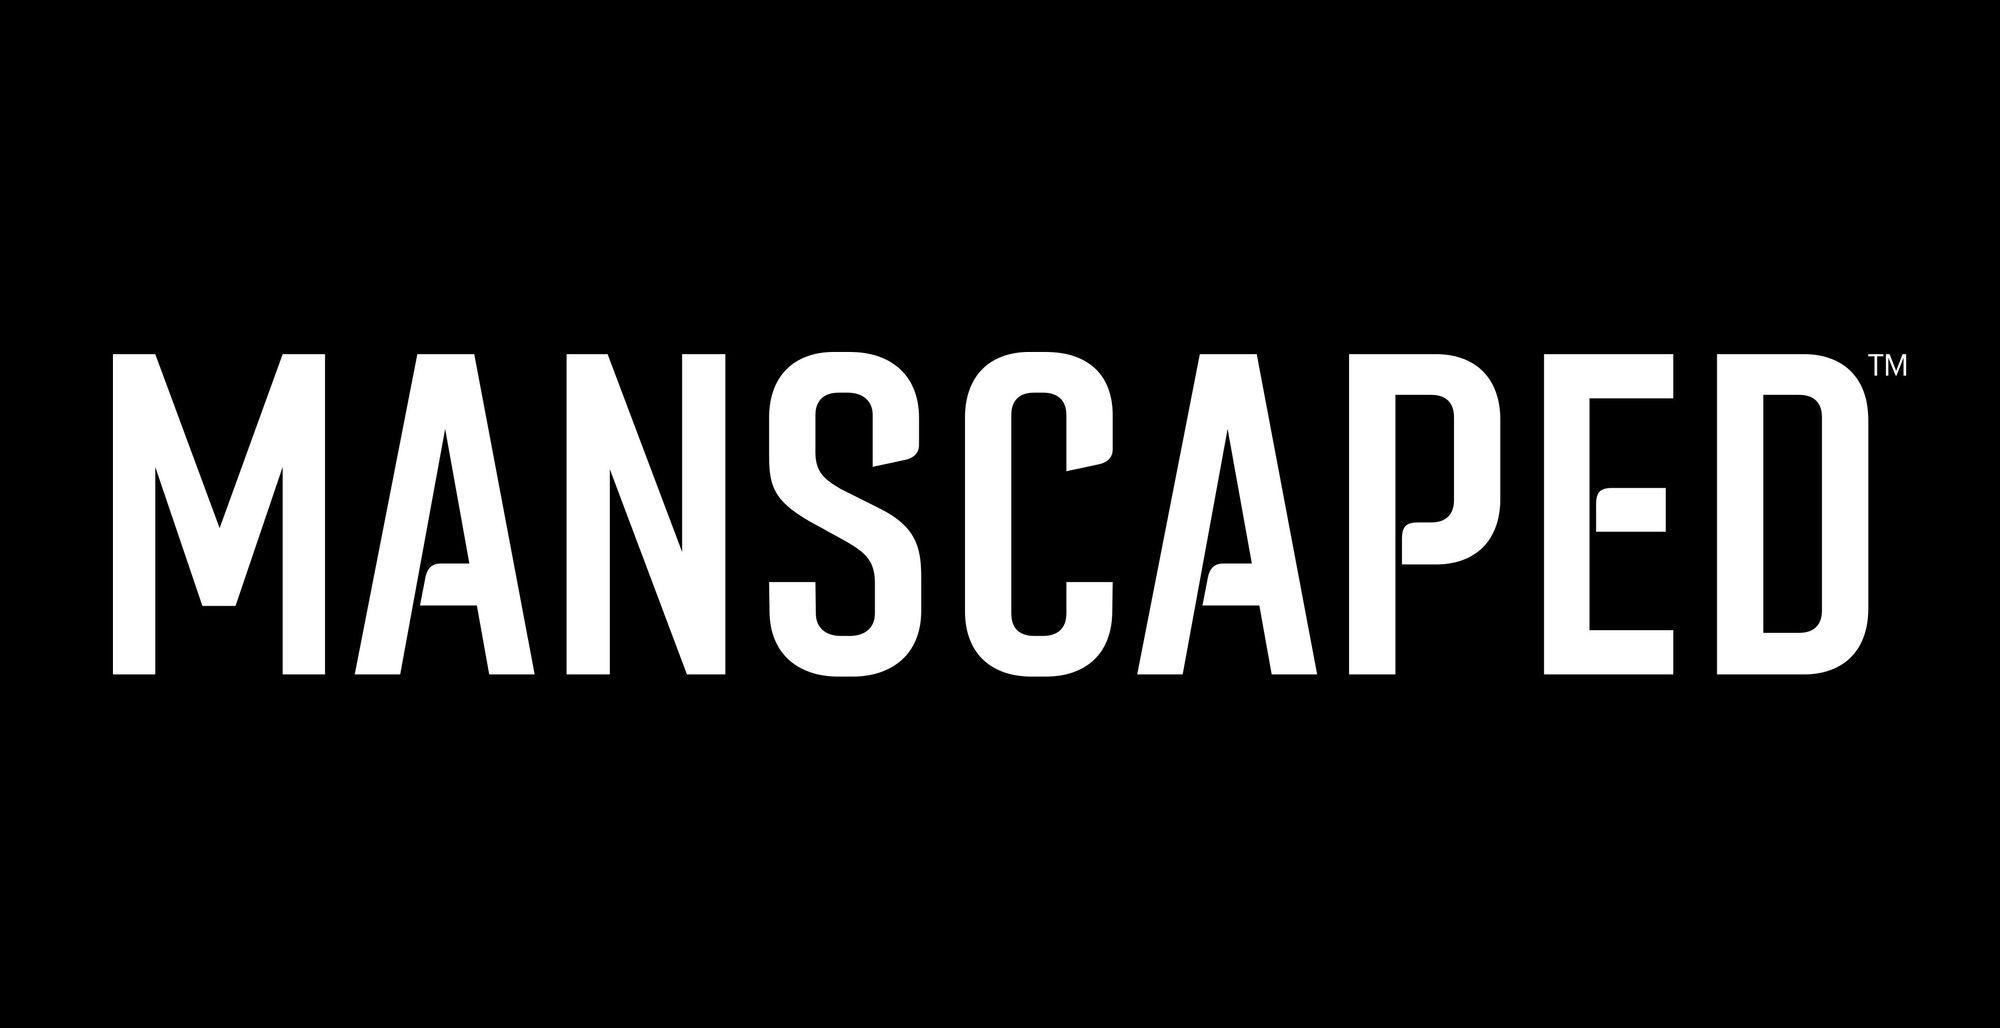 Where Do The Manscaped™ Crop Preserver® Ship To?